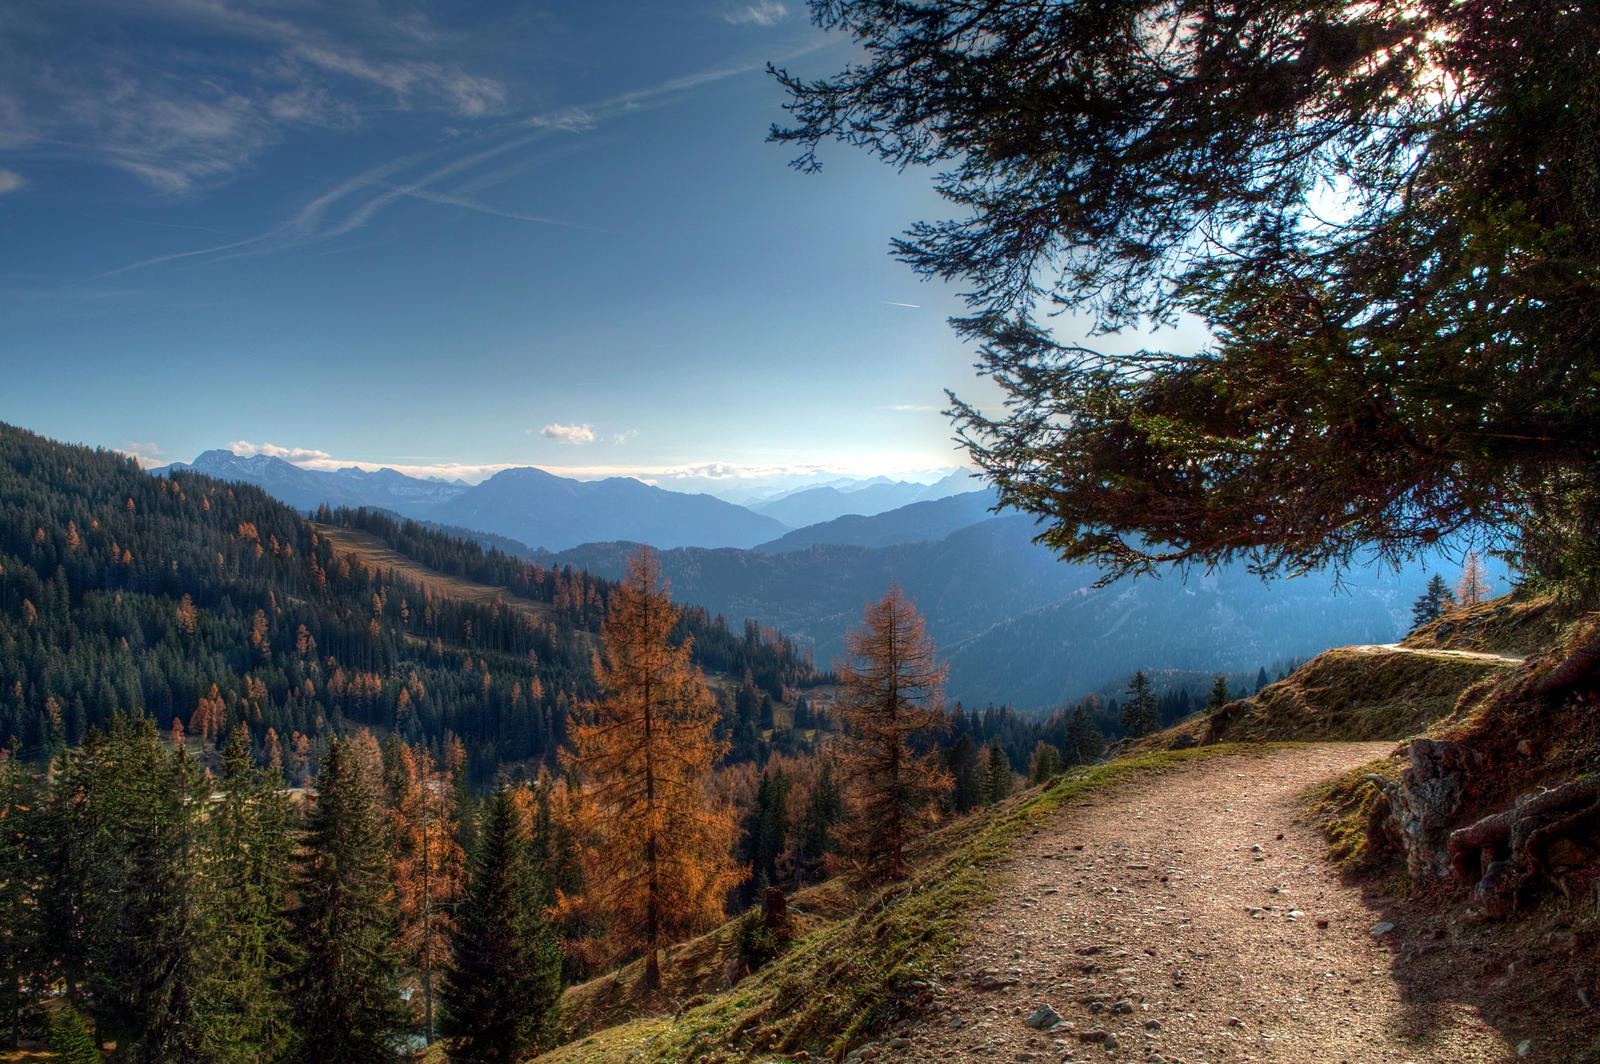 Highway by Burtn